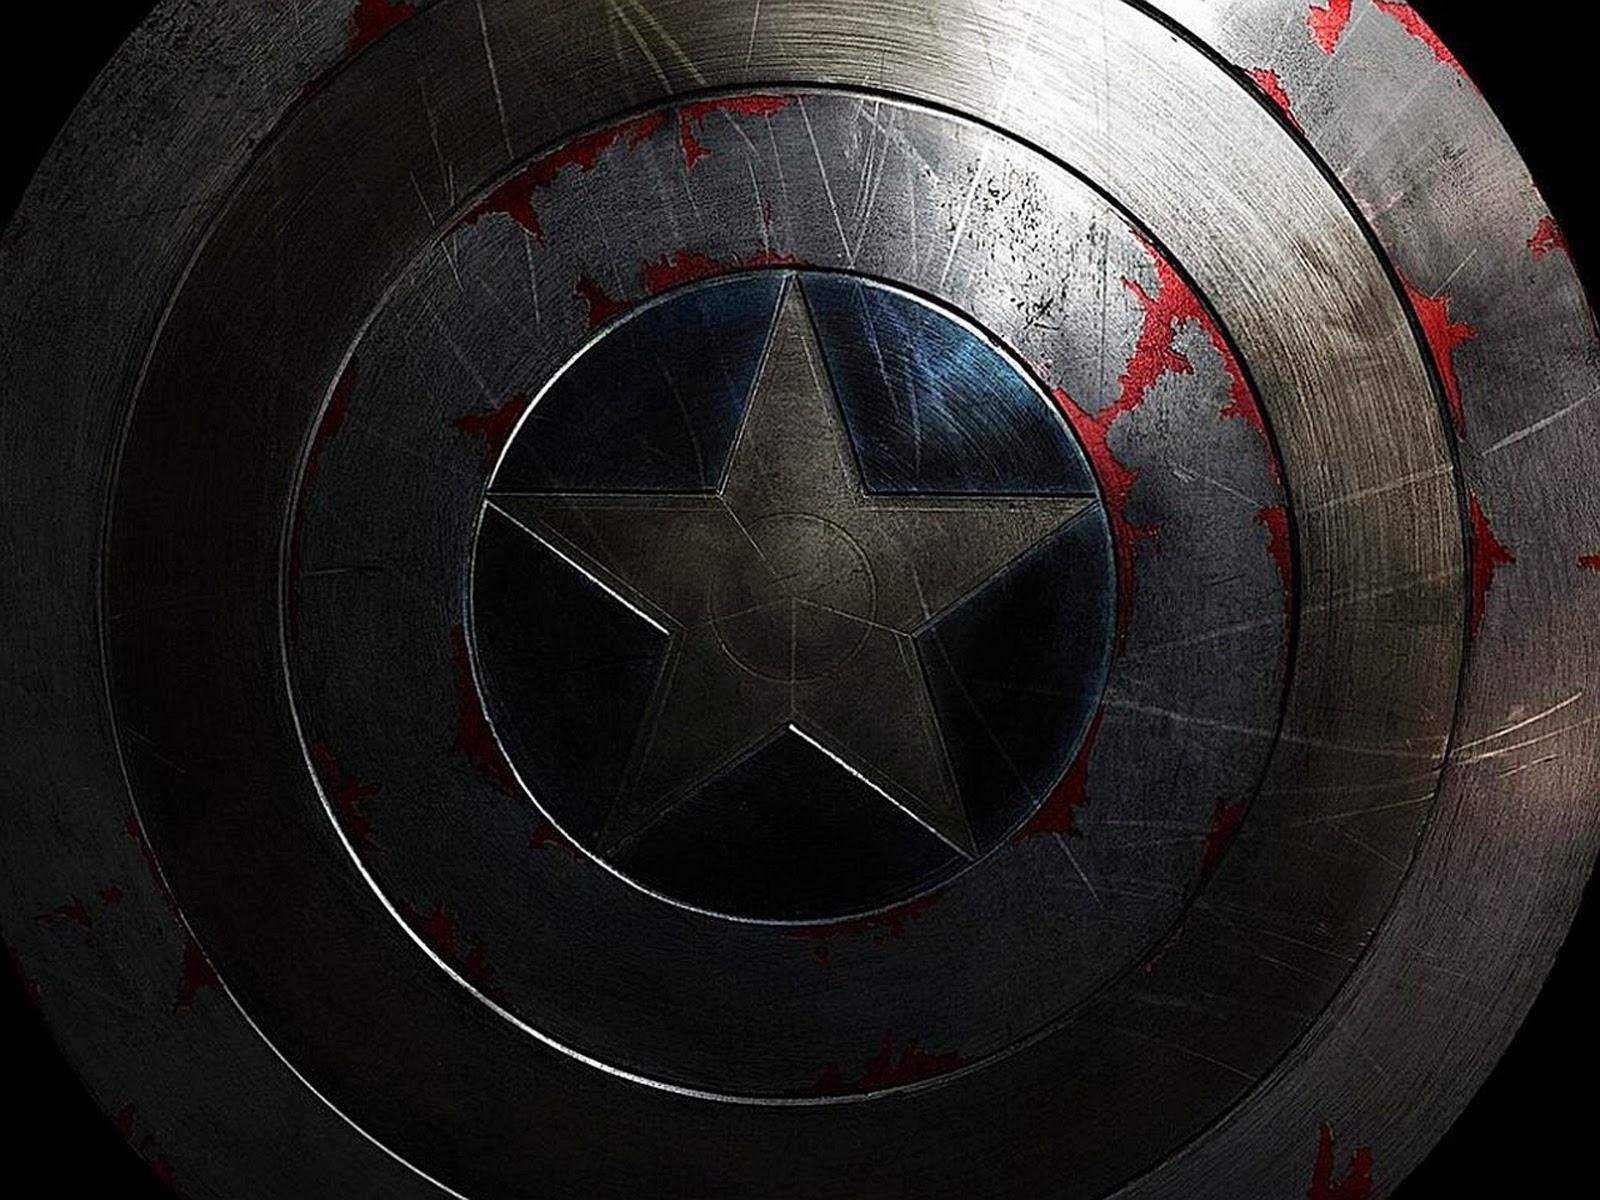 captain america 2 the winter soldier star shield 2014 marvel movie hd 1600x1200